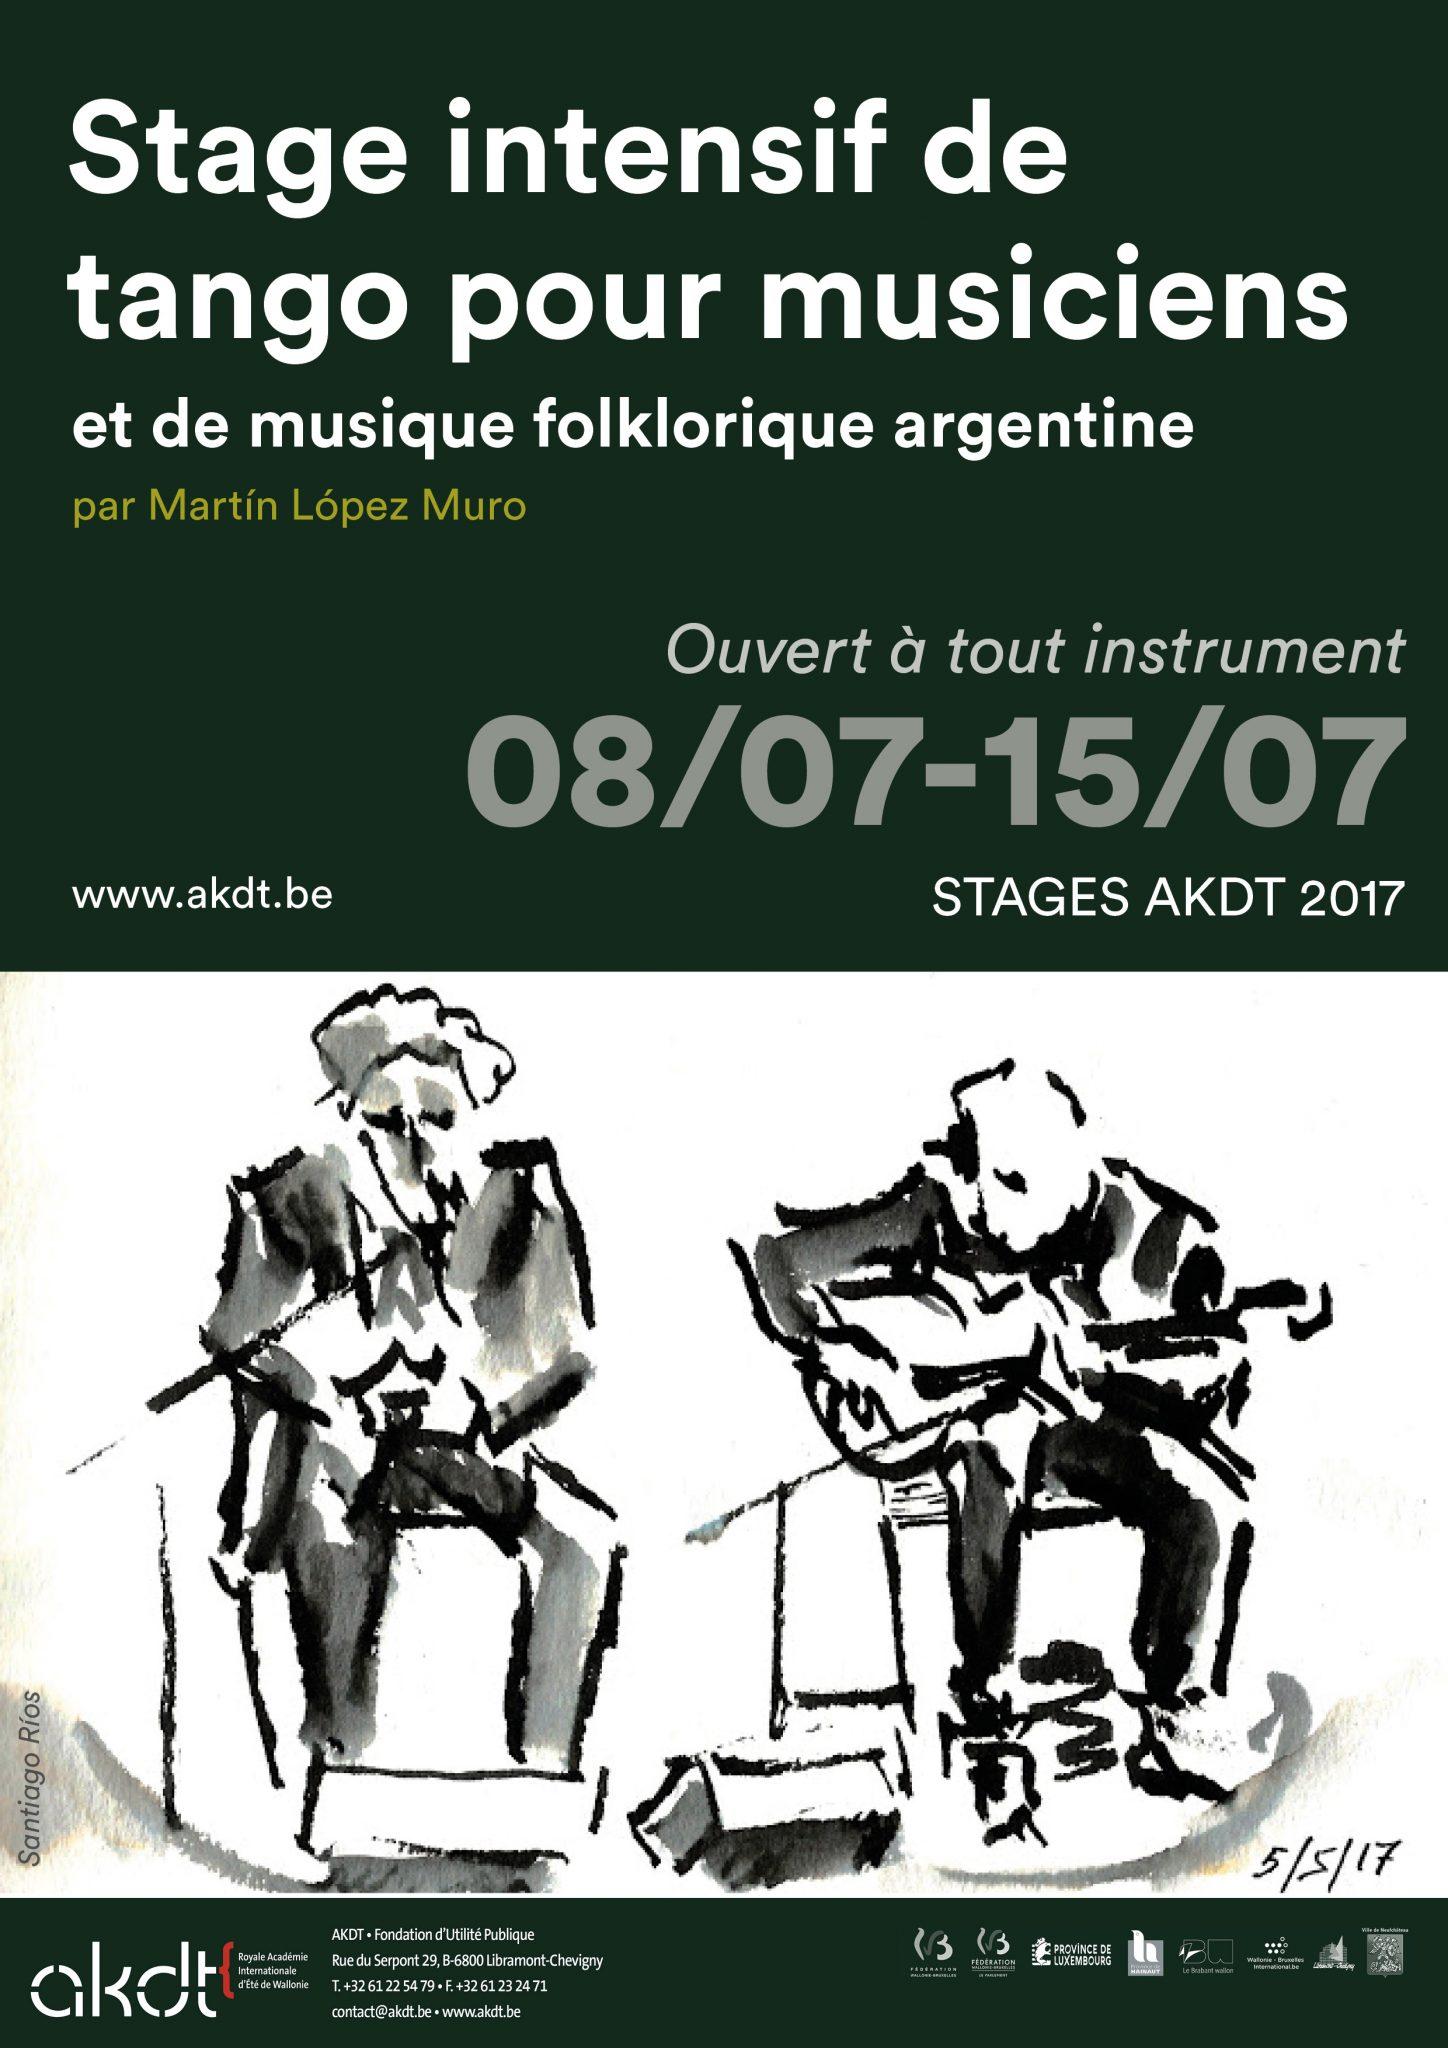 Tango Workshop for musiciens @ Akdt Neufchateau | Waals Gewest | België